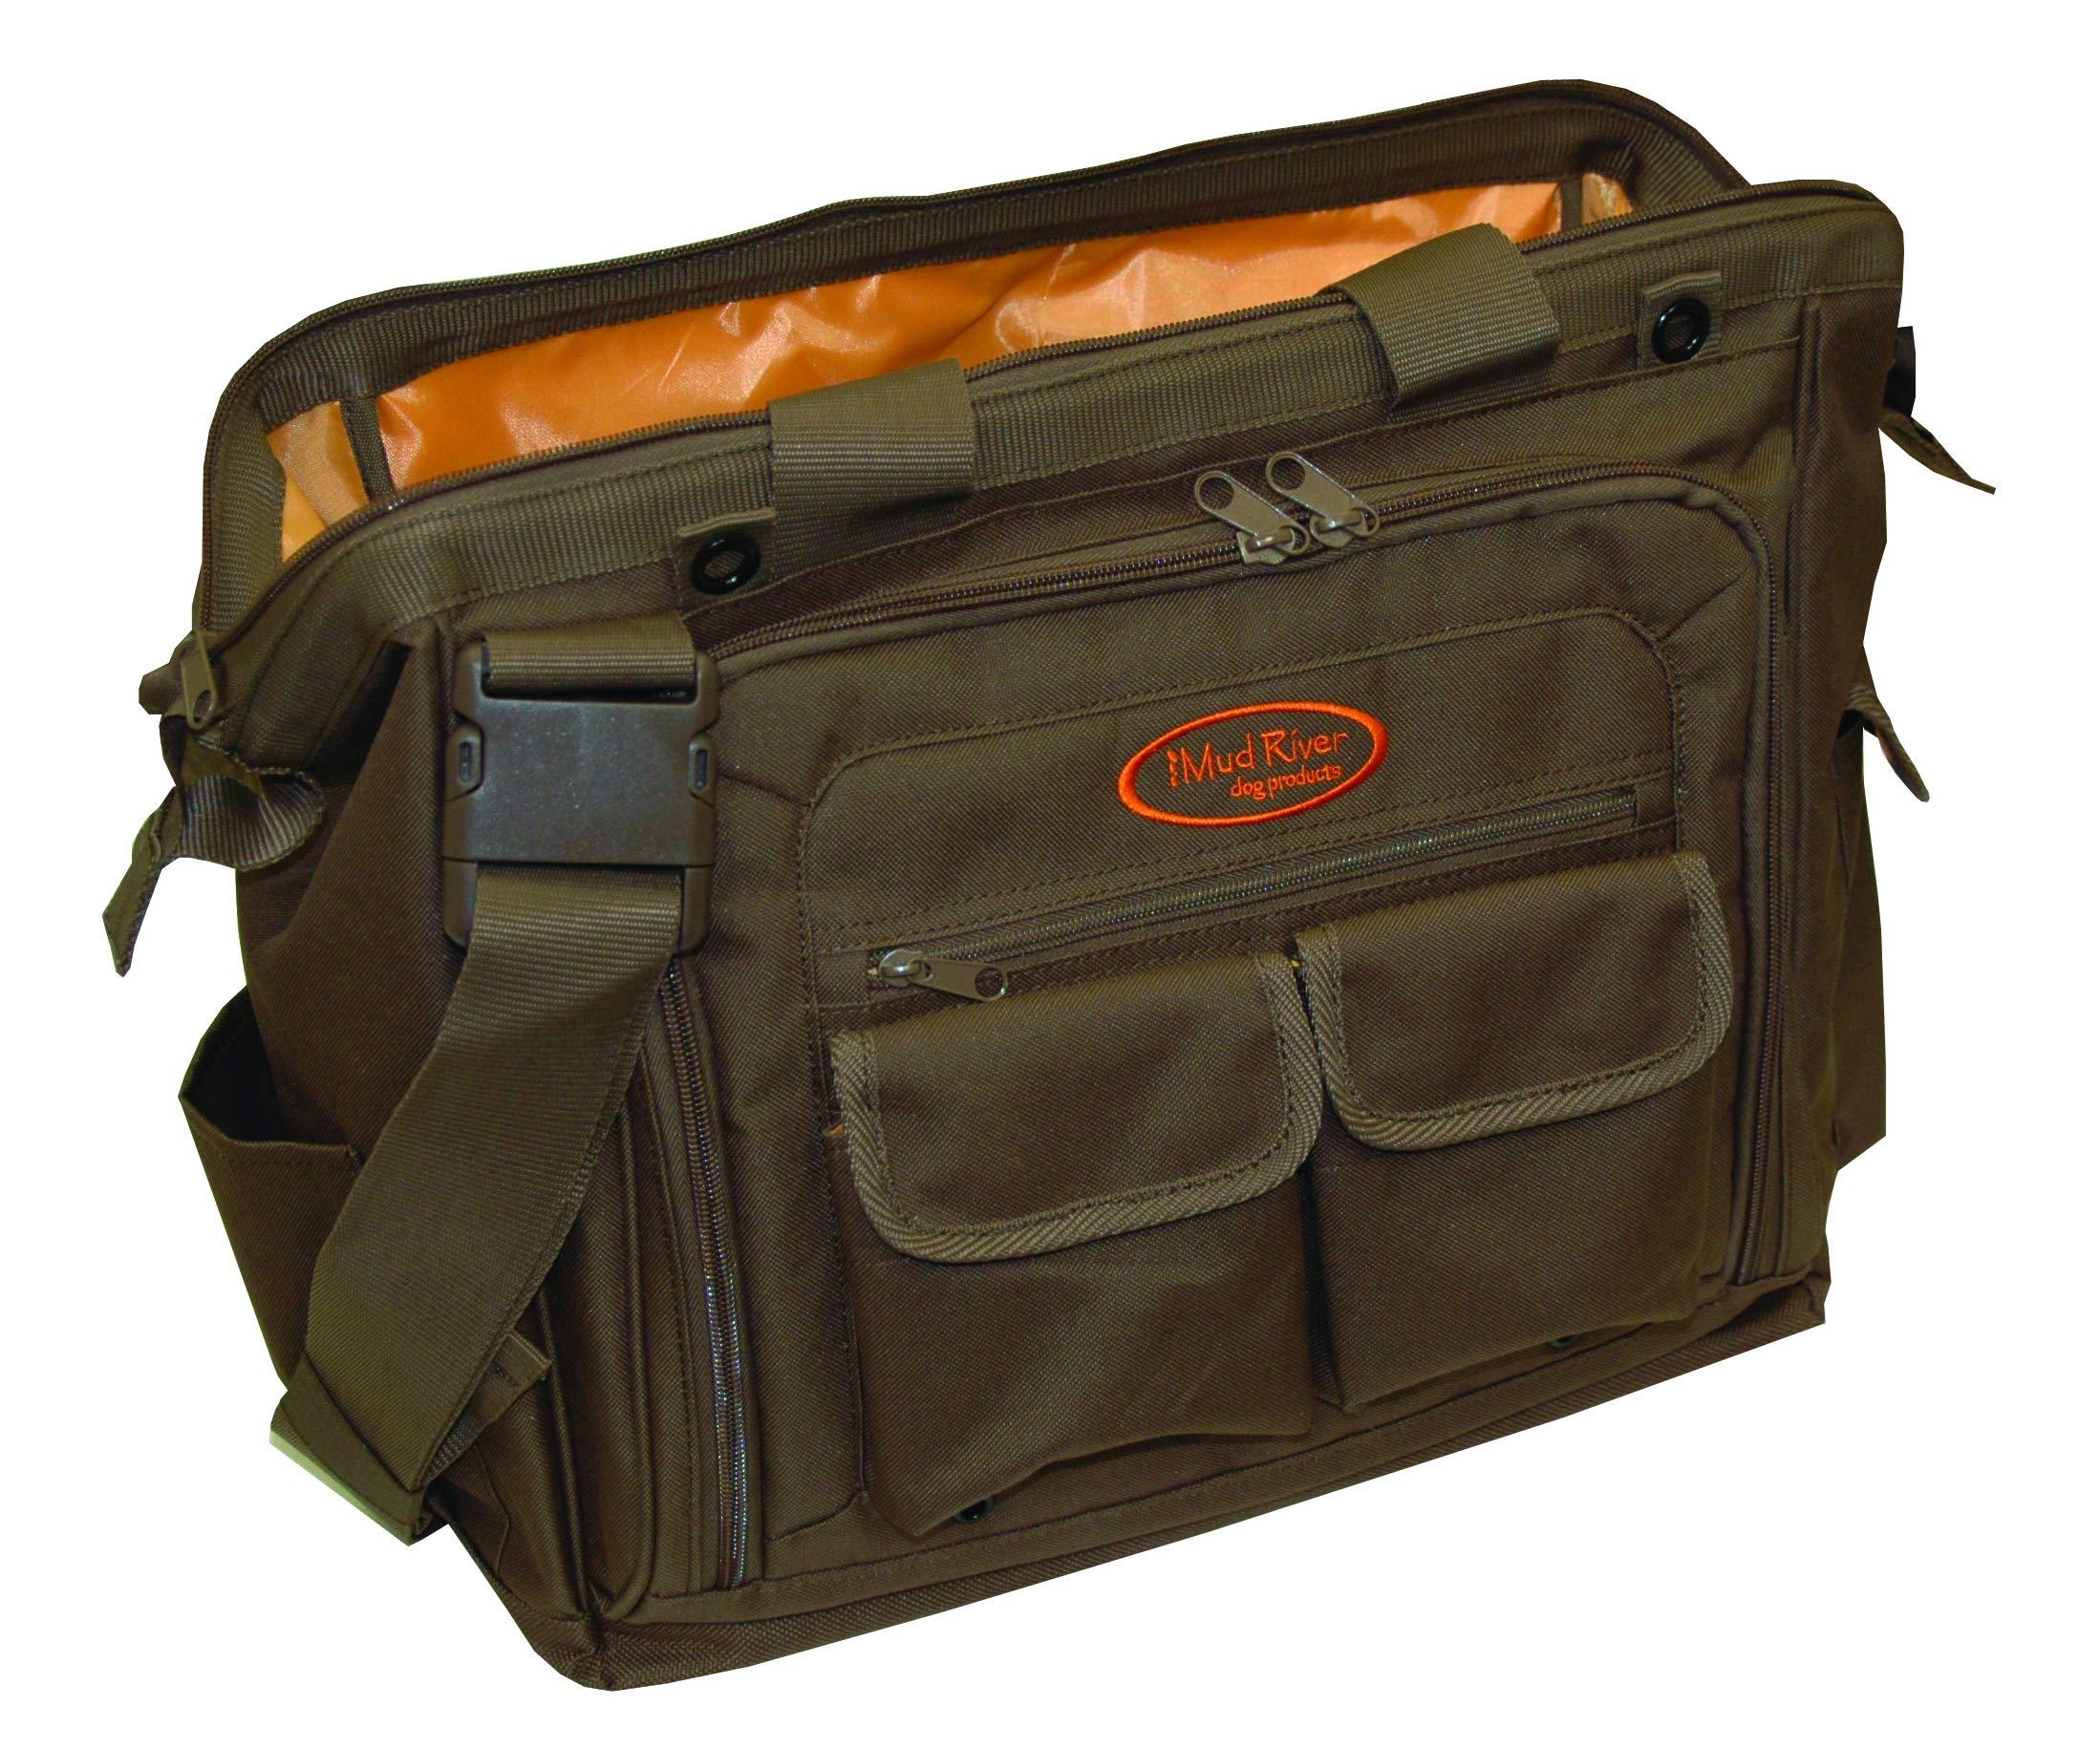 Mud River Dog Handlers Bag, 16'' x 11'' x 14'', Brown